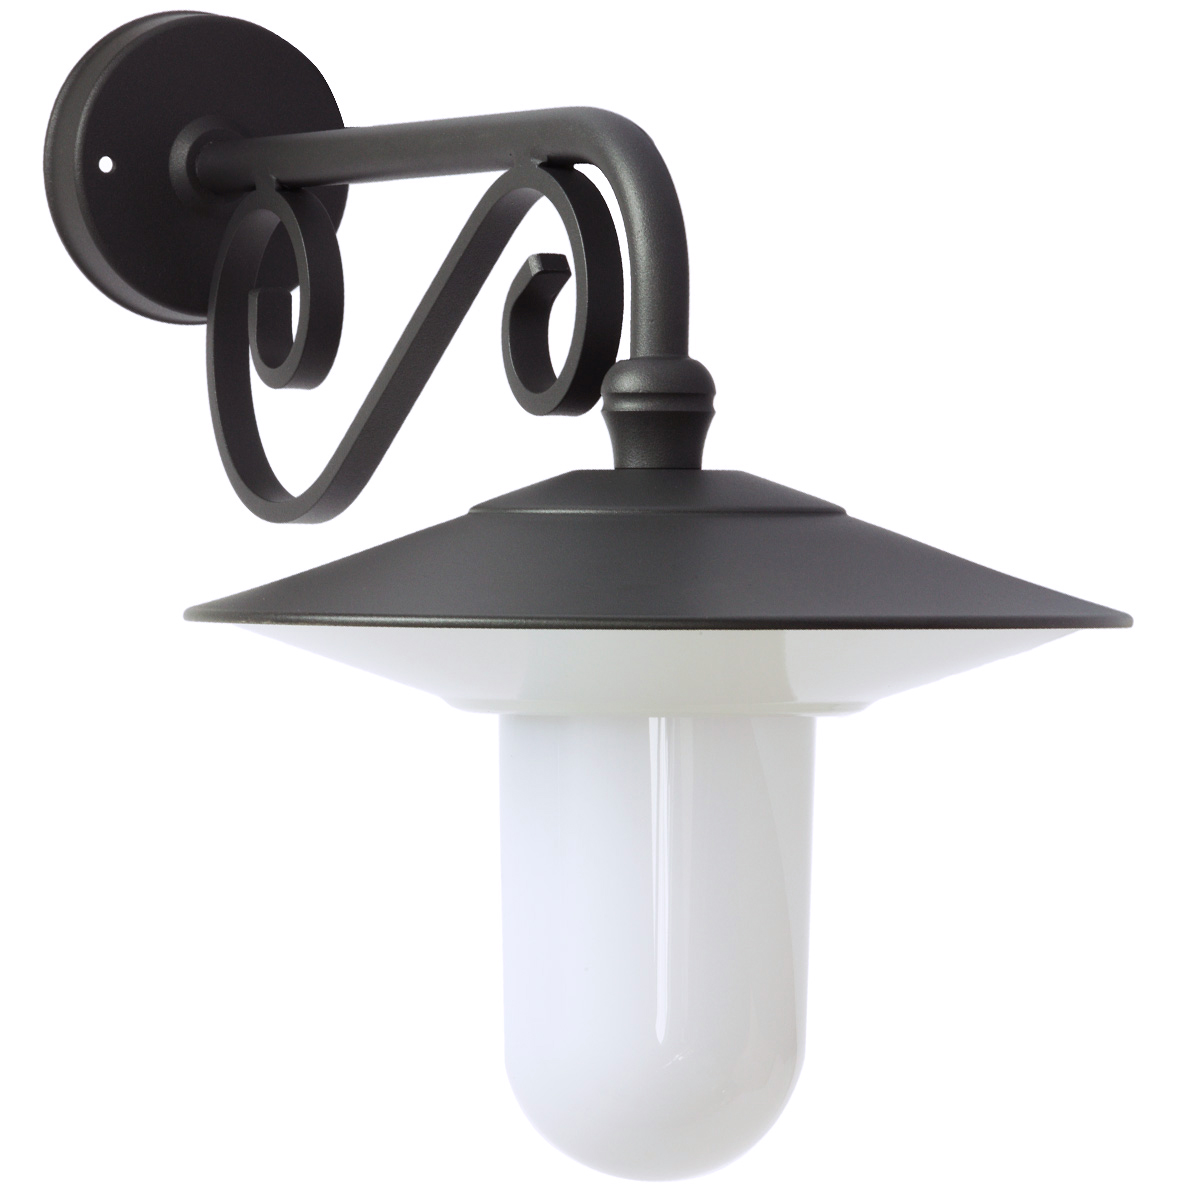 Au en wandlampe mit zierteil am wandarm terra lumi - Aussen wandlampe ...